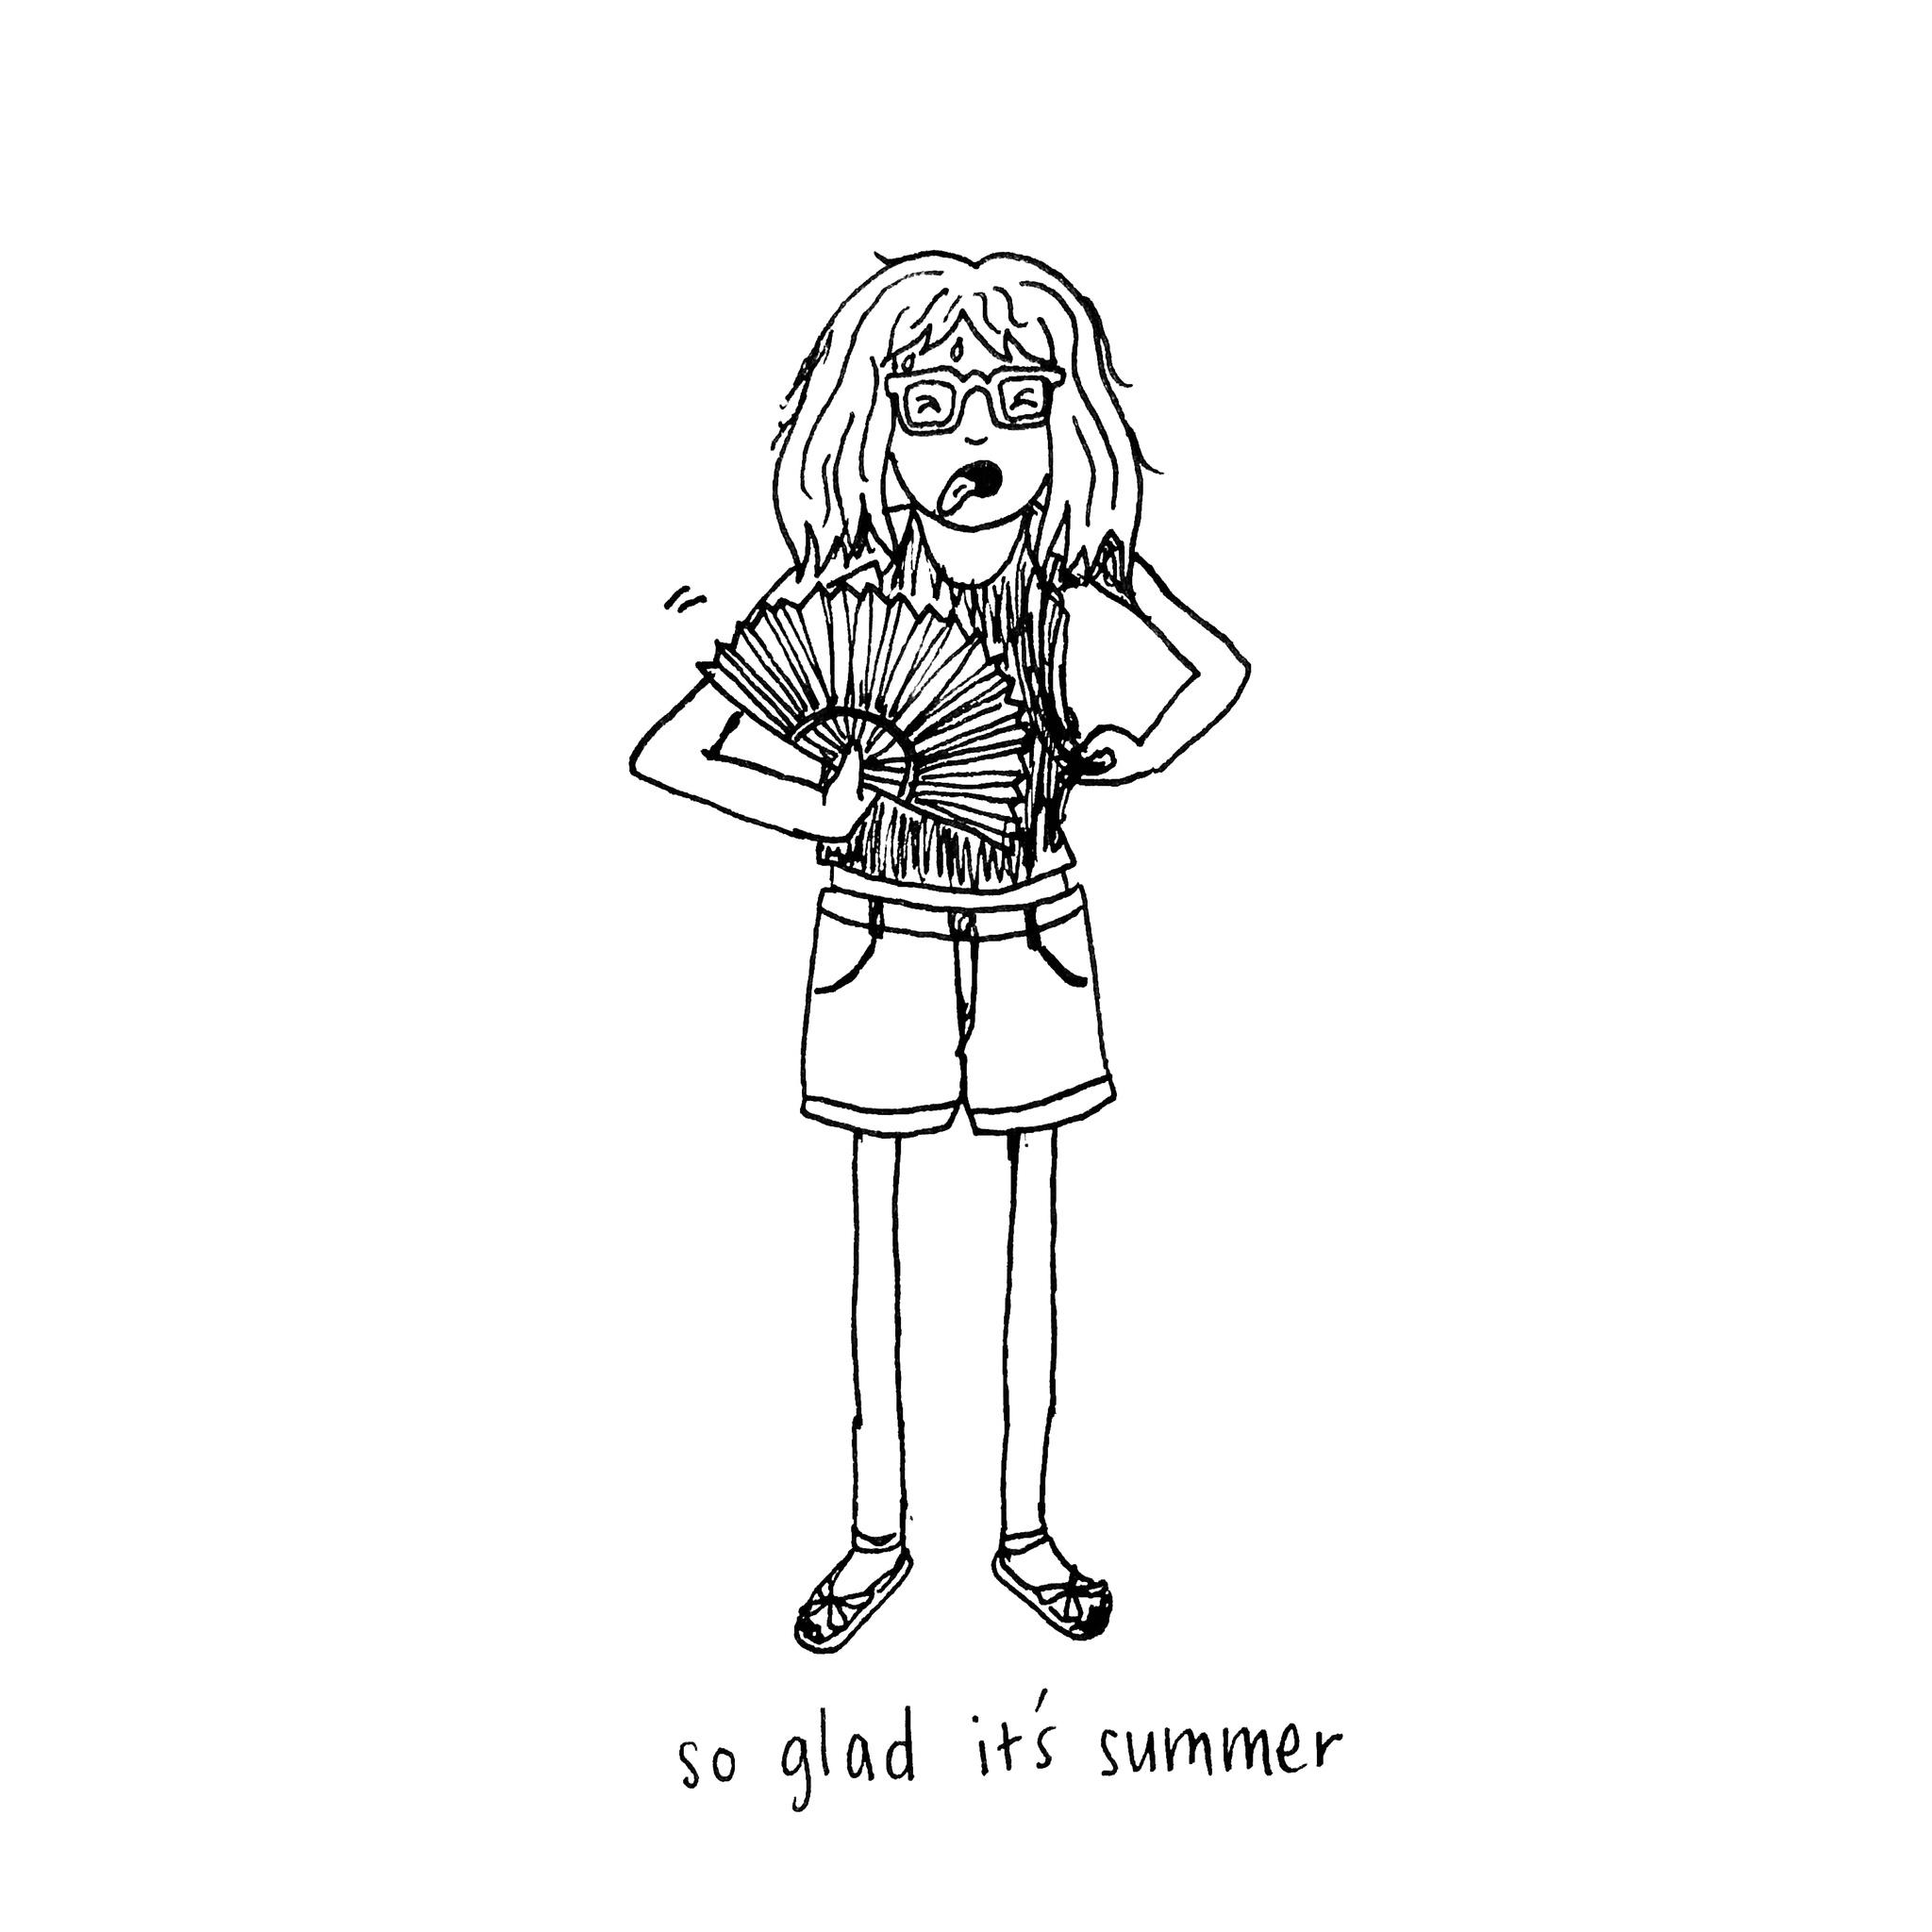 042_lucy-chen_so-glad-its-summer.JPG